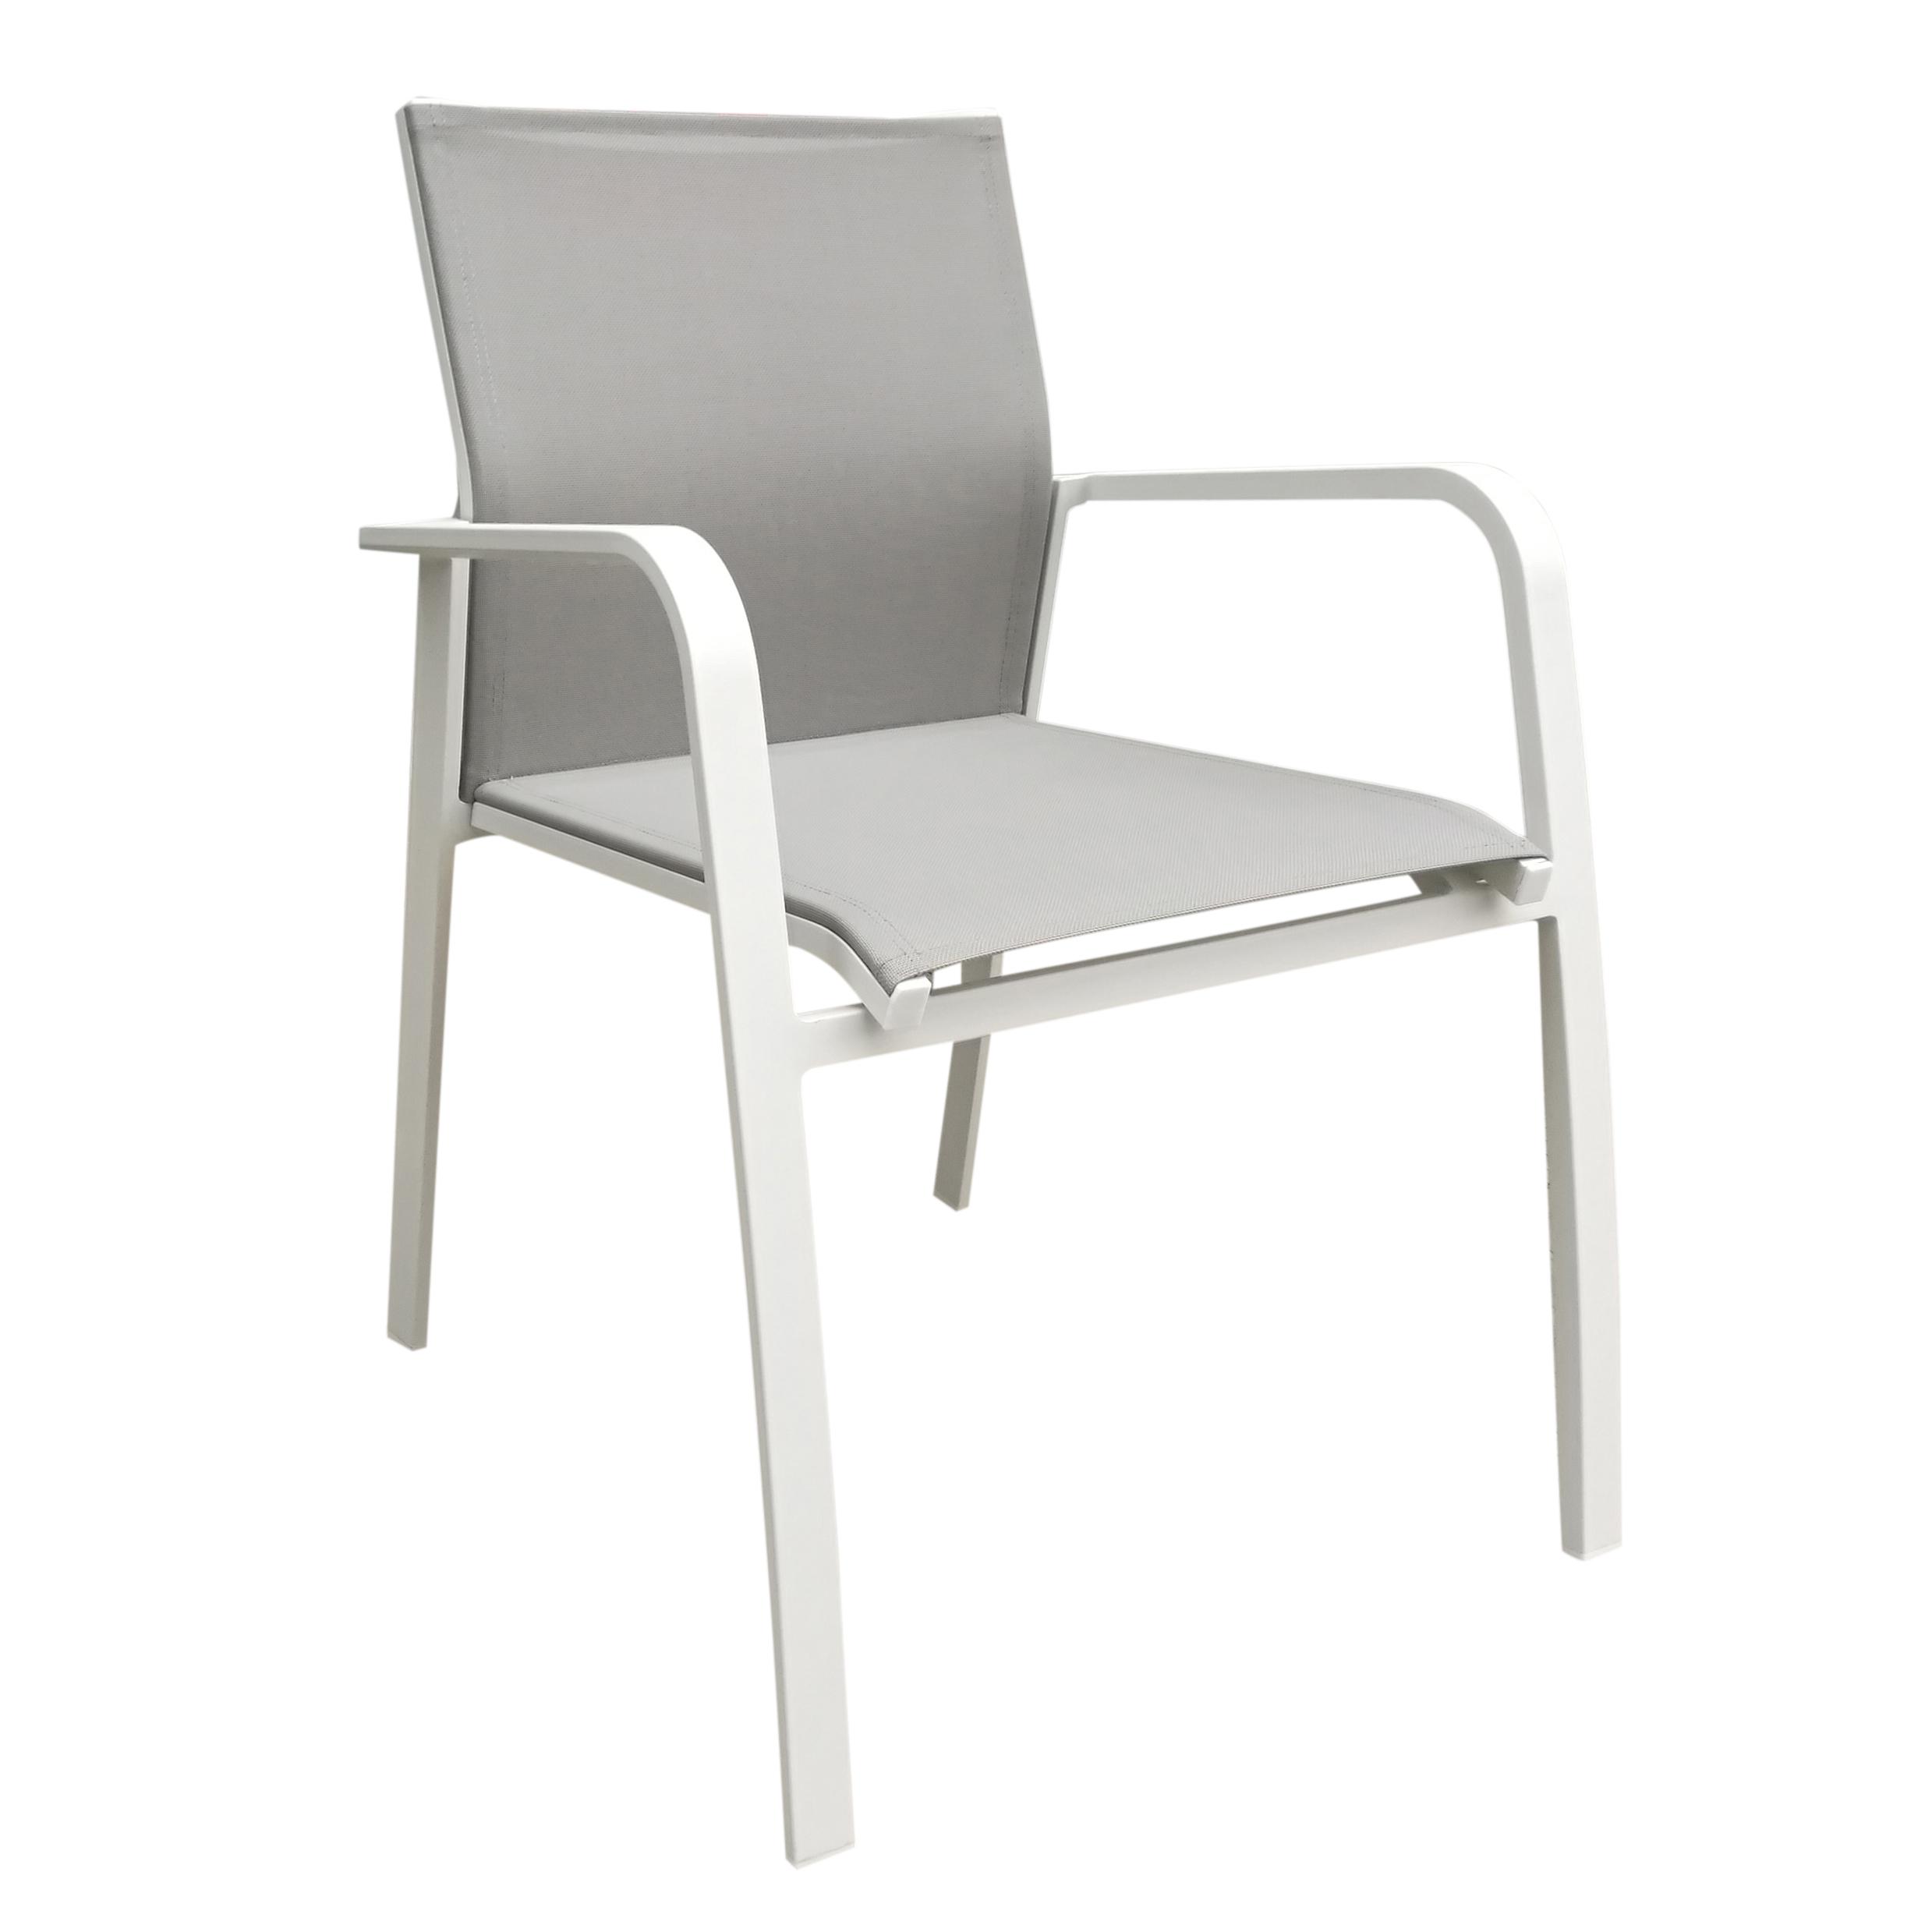 Chaise De Jardin Aluminium Charmant Chaise Jardin Alu Blanc